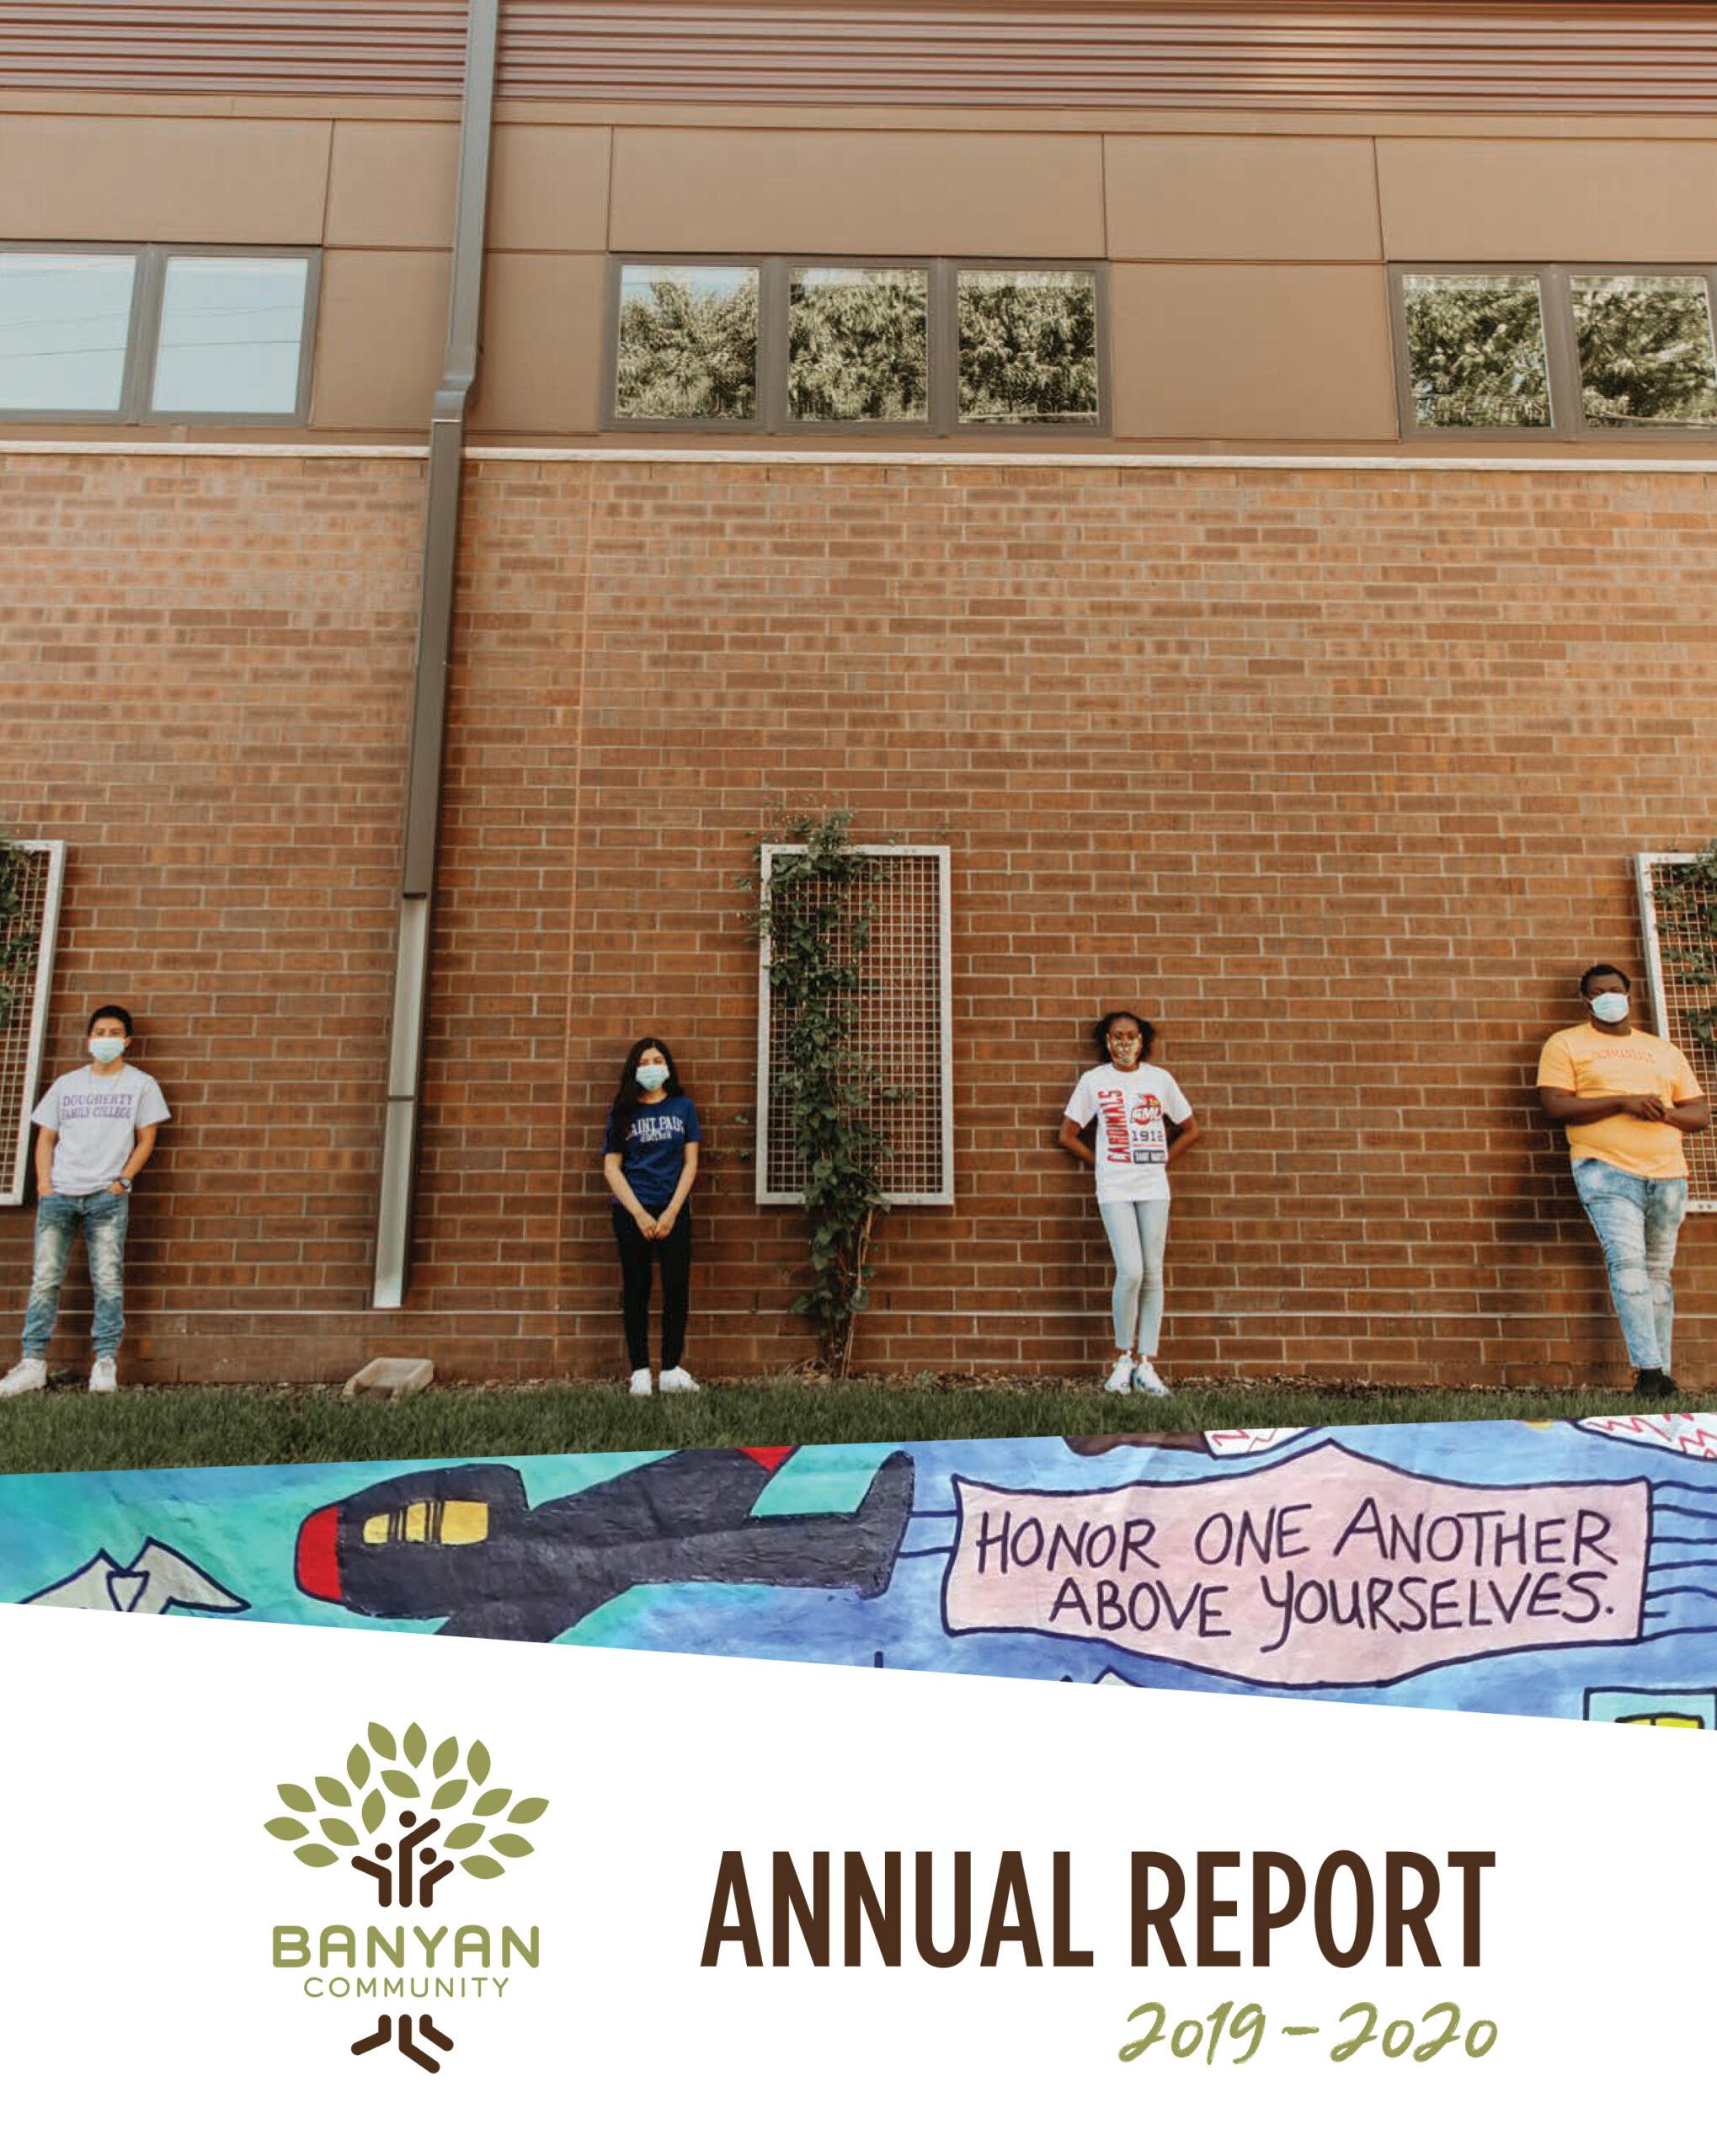 Banyan Community Annual Report